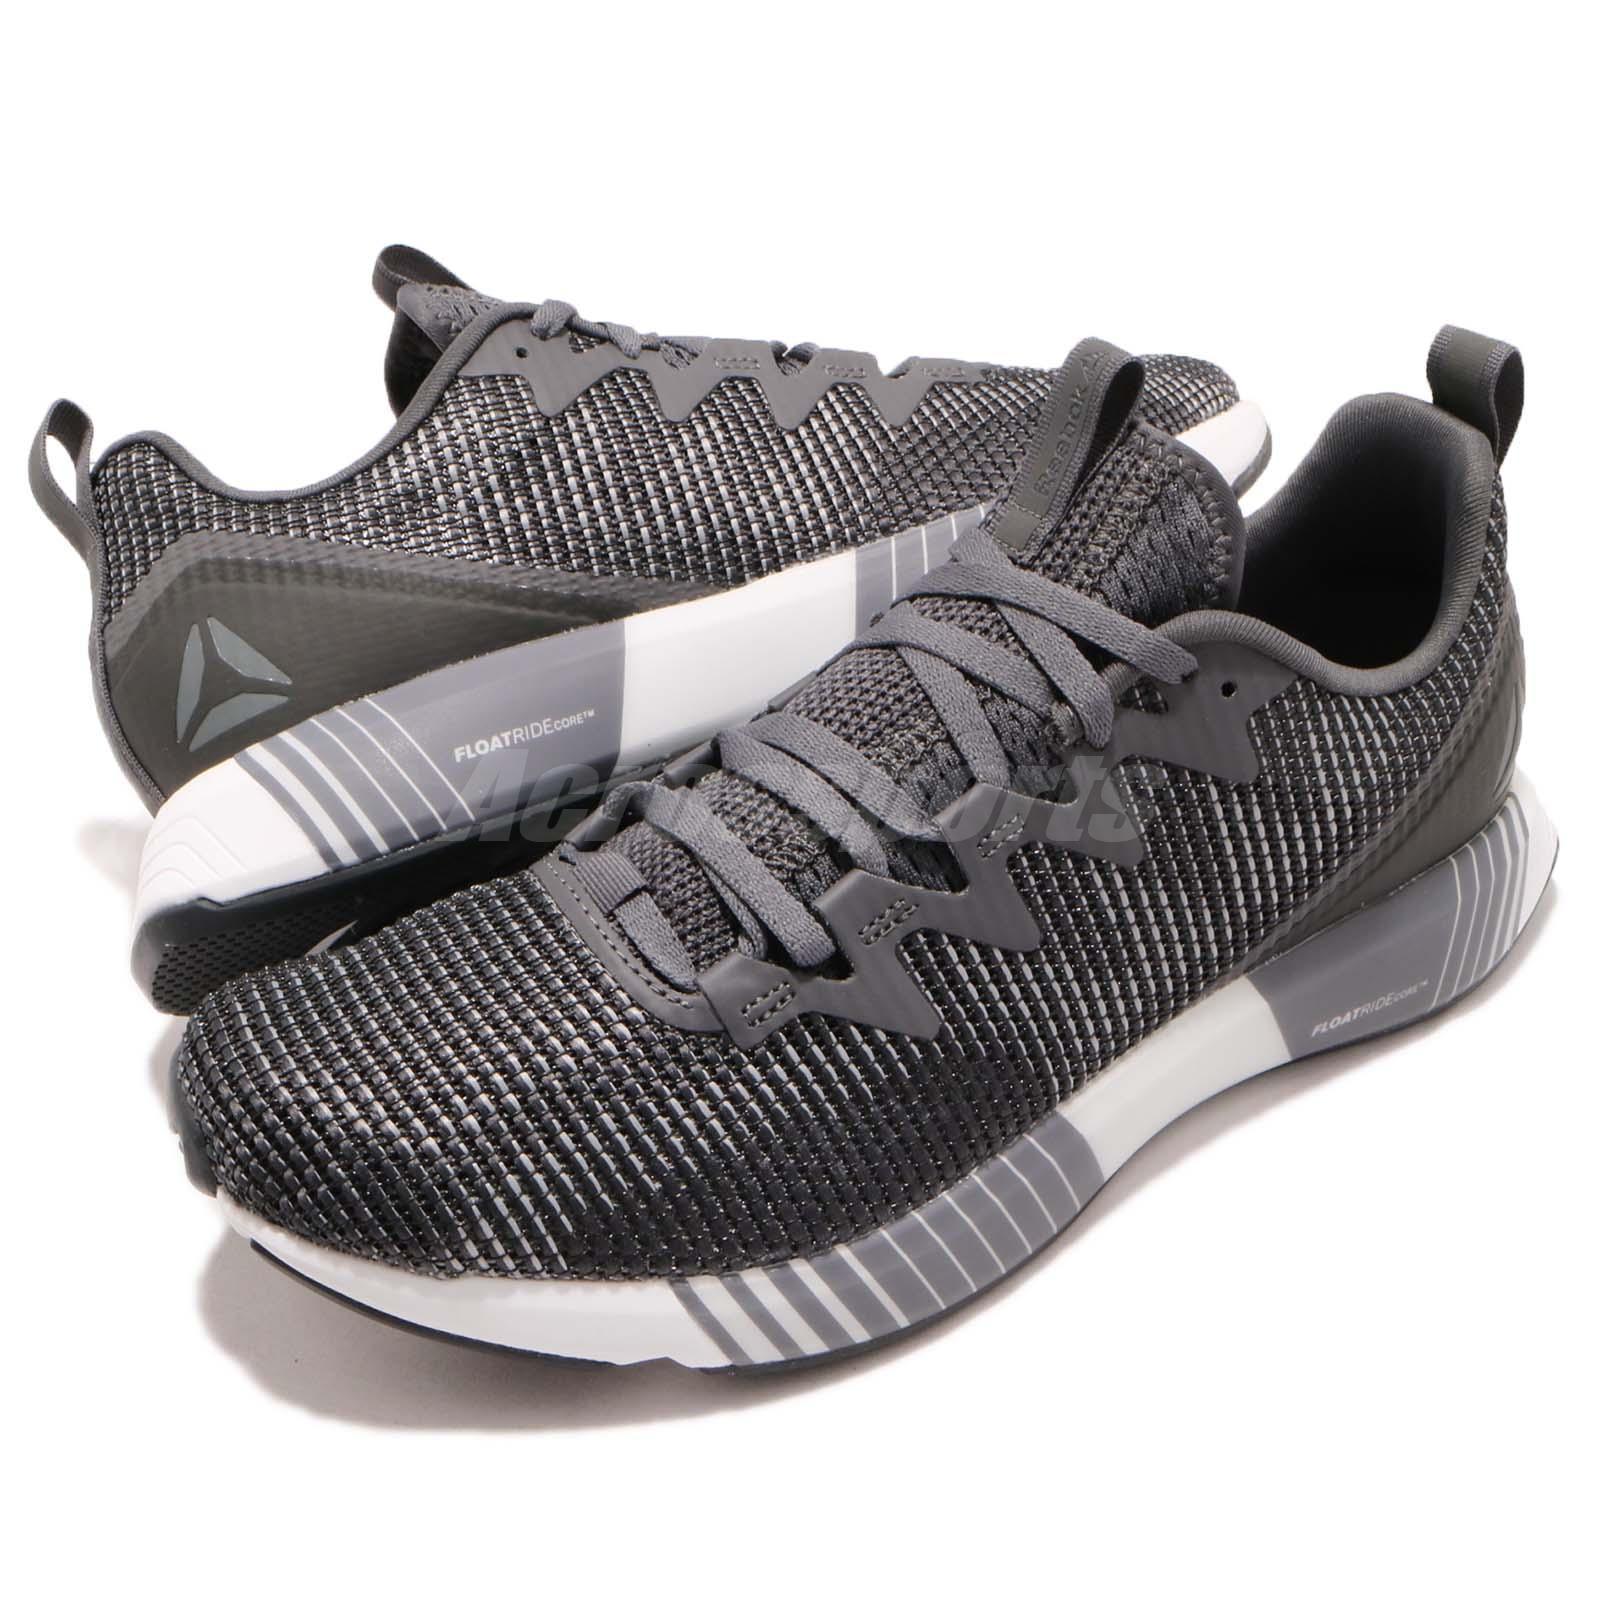 a0b1664bdc15 Details about Reebok Fusion Flexweave Grey Coal White Men Running Training  Shoe Sneaker CN2854